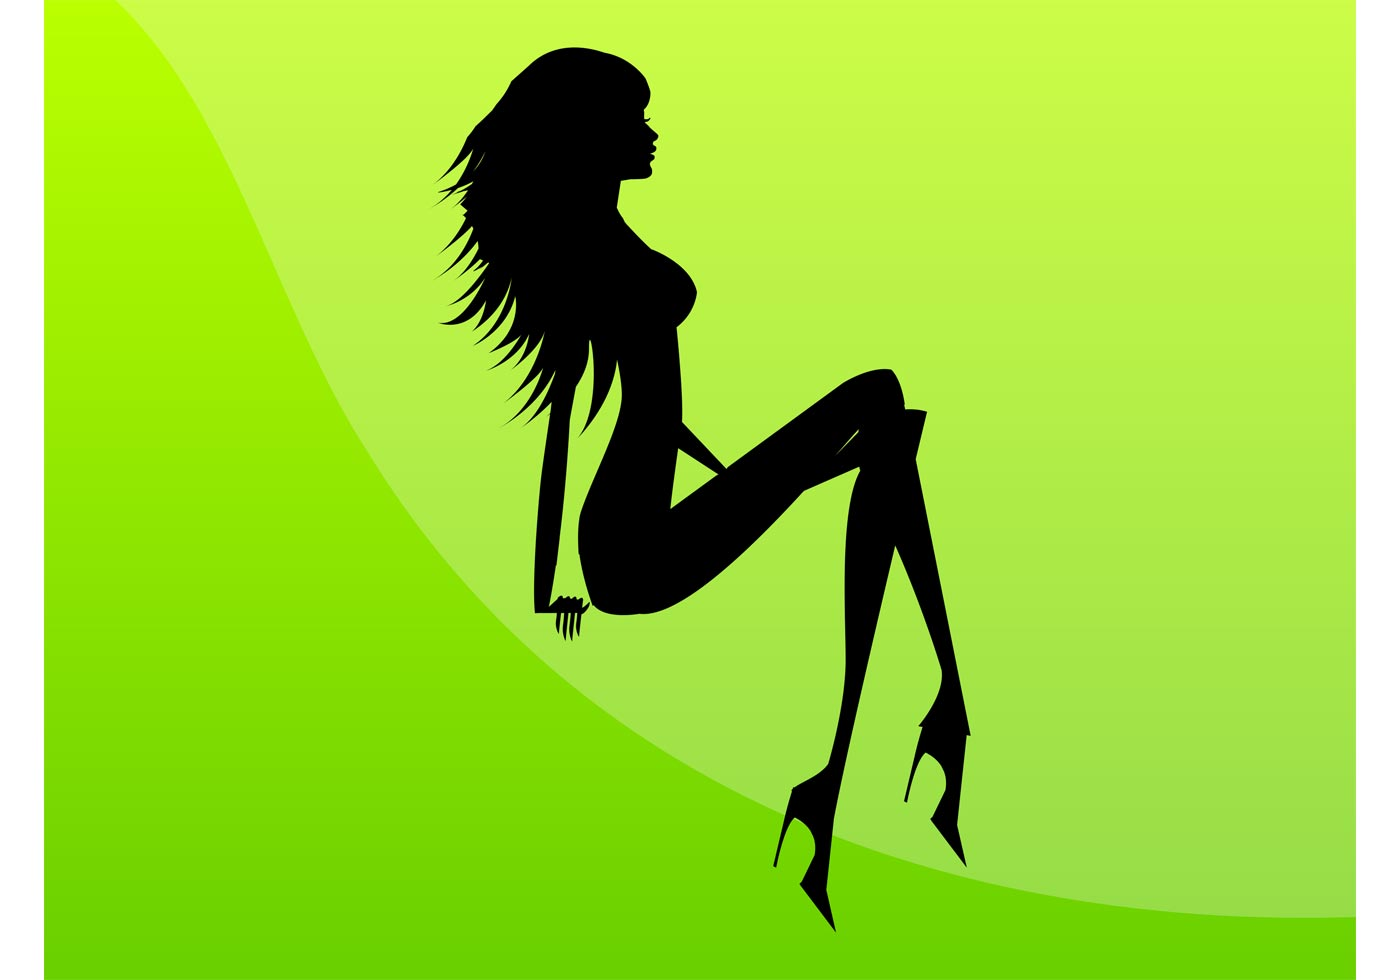 Myspace sexy girl graphics-1645